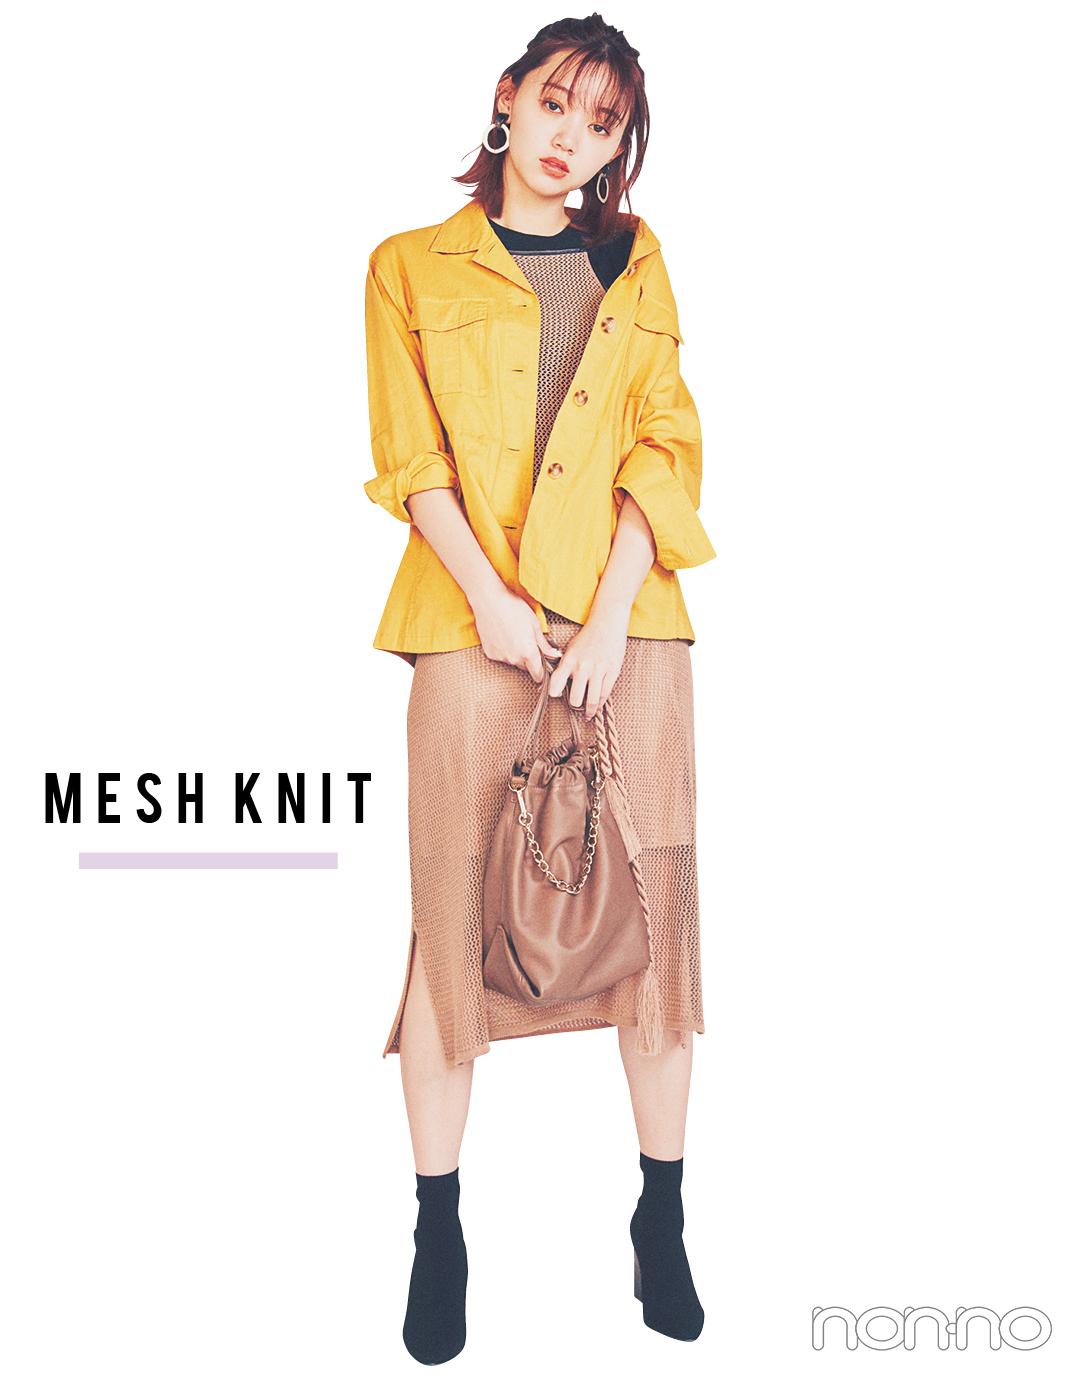 mesh knit